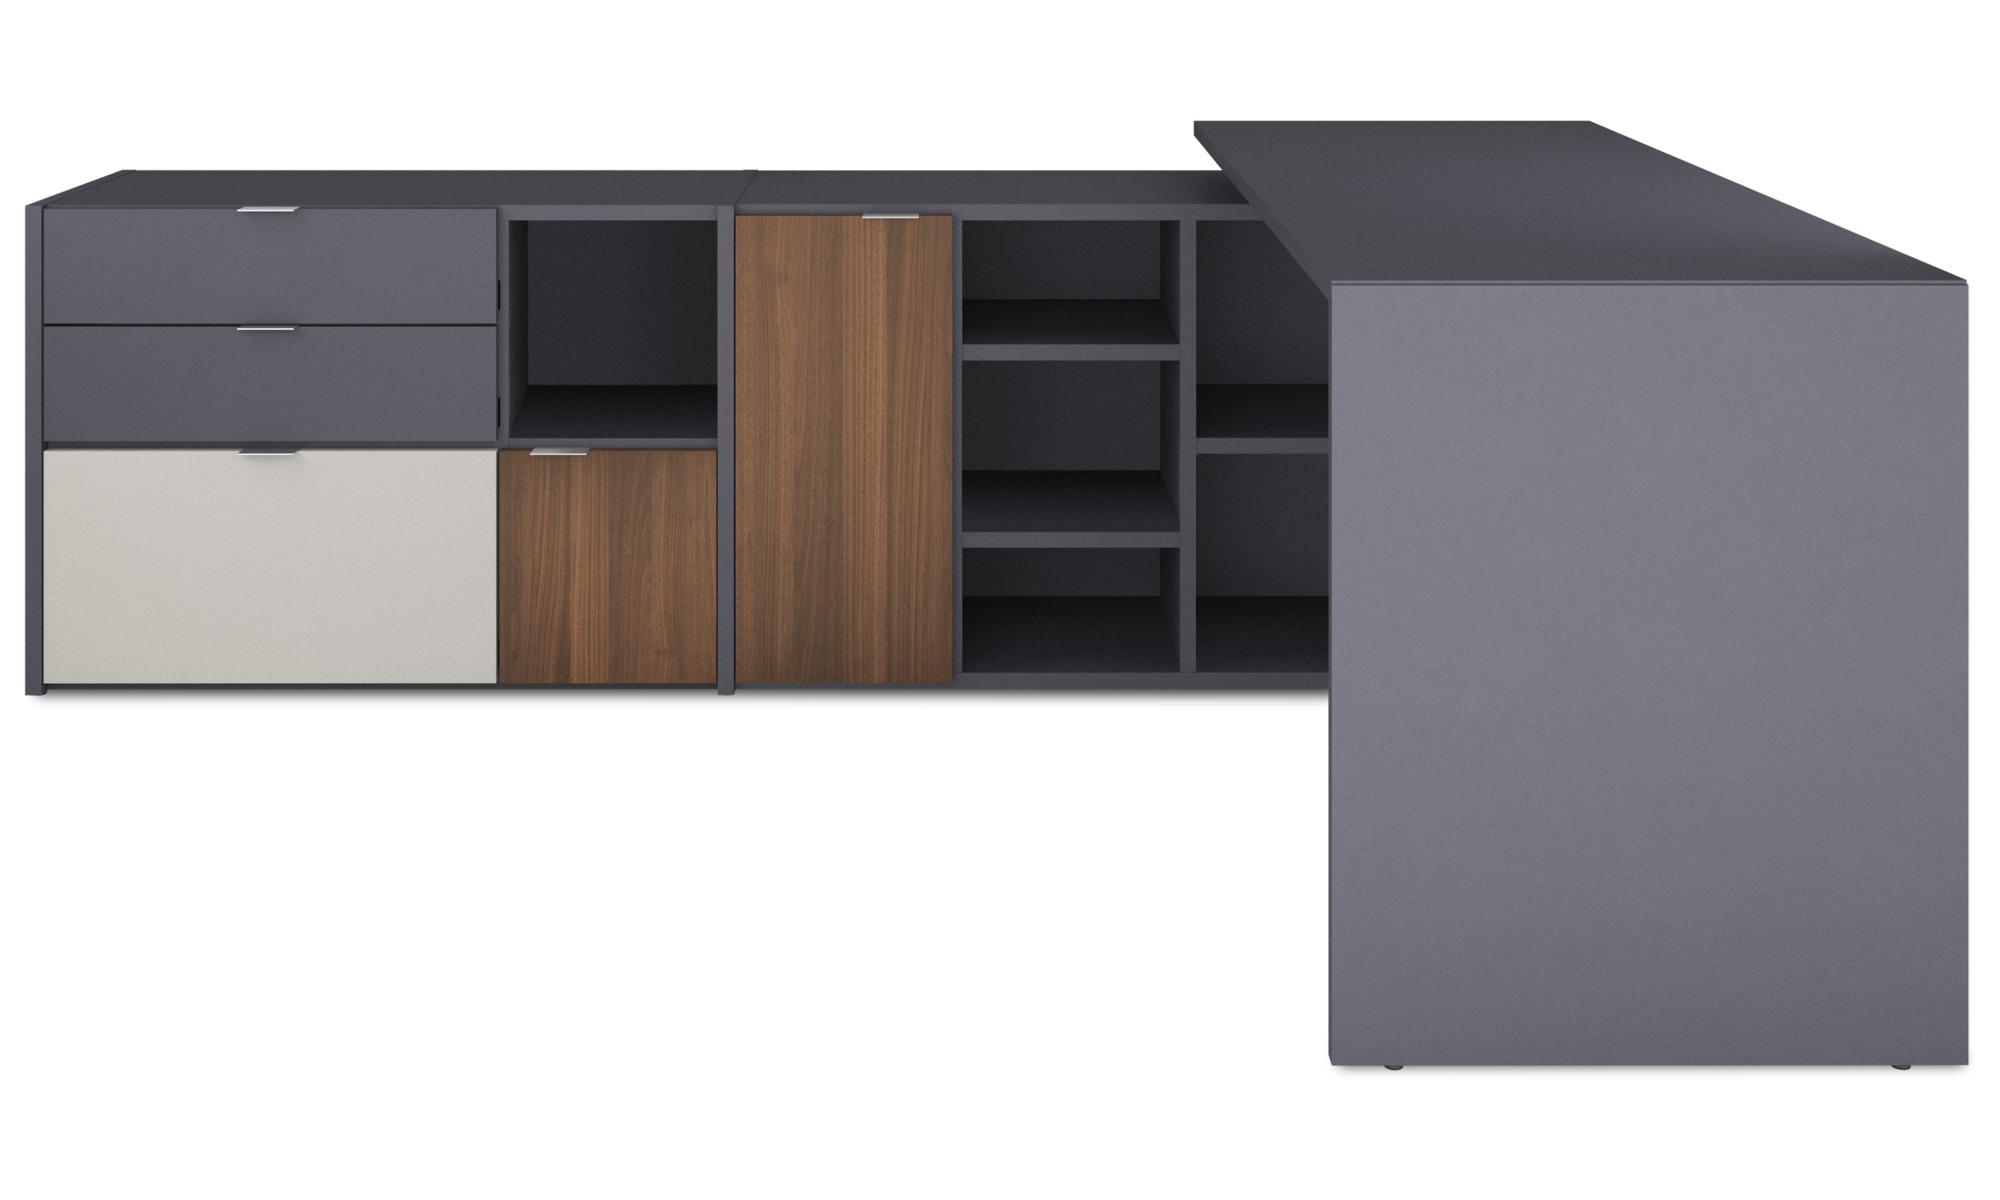 Desks - Copenhagen office system - Gray - Lacquered